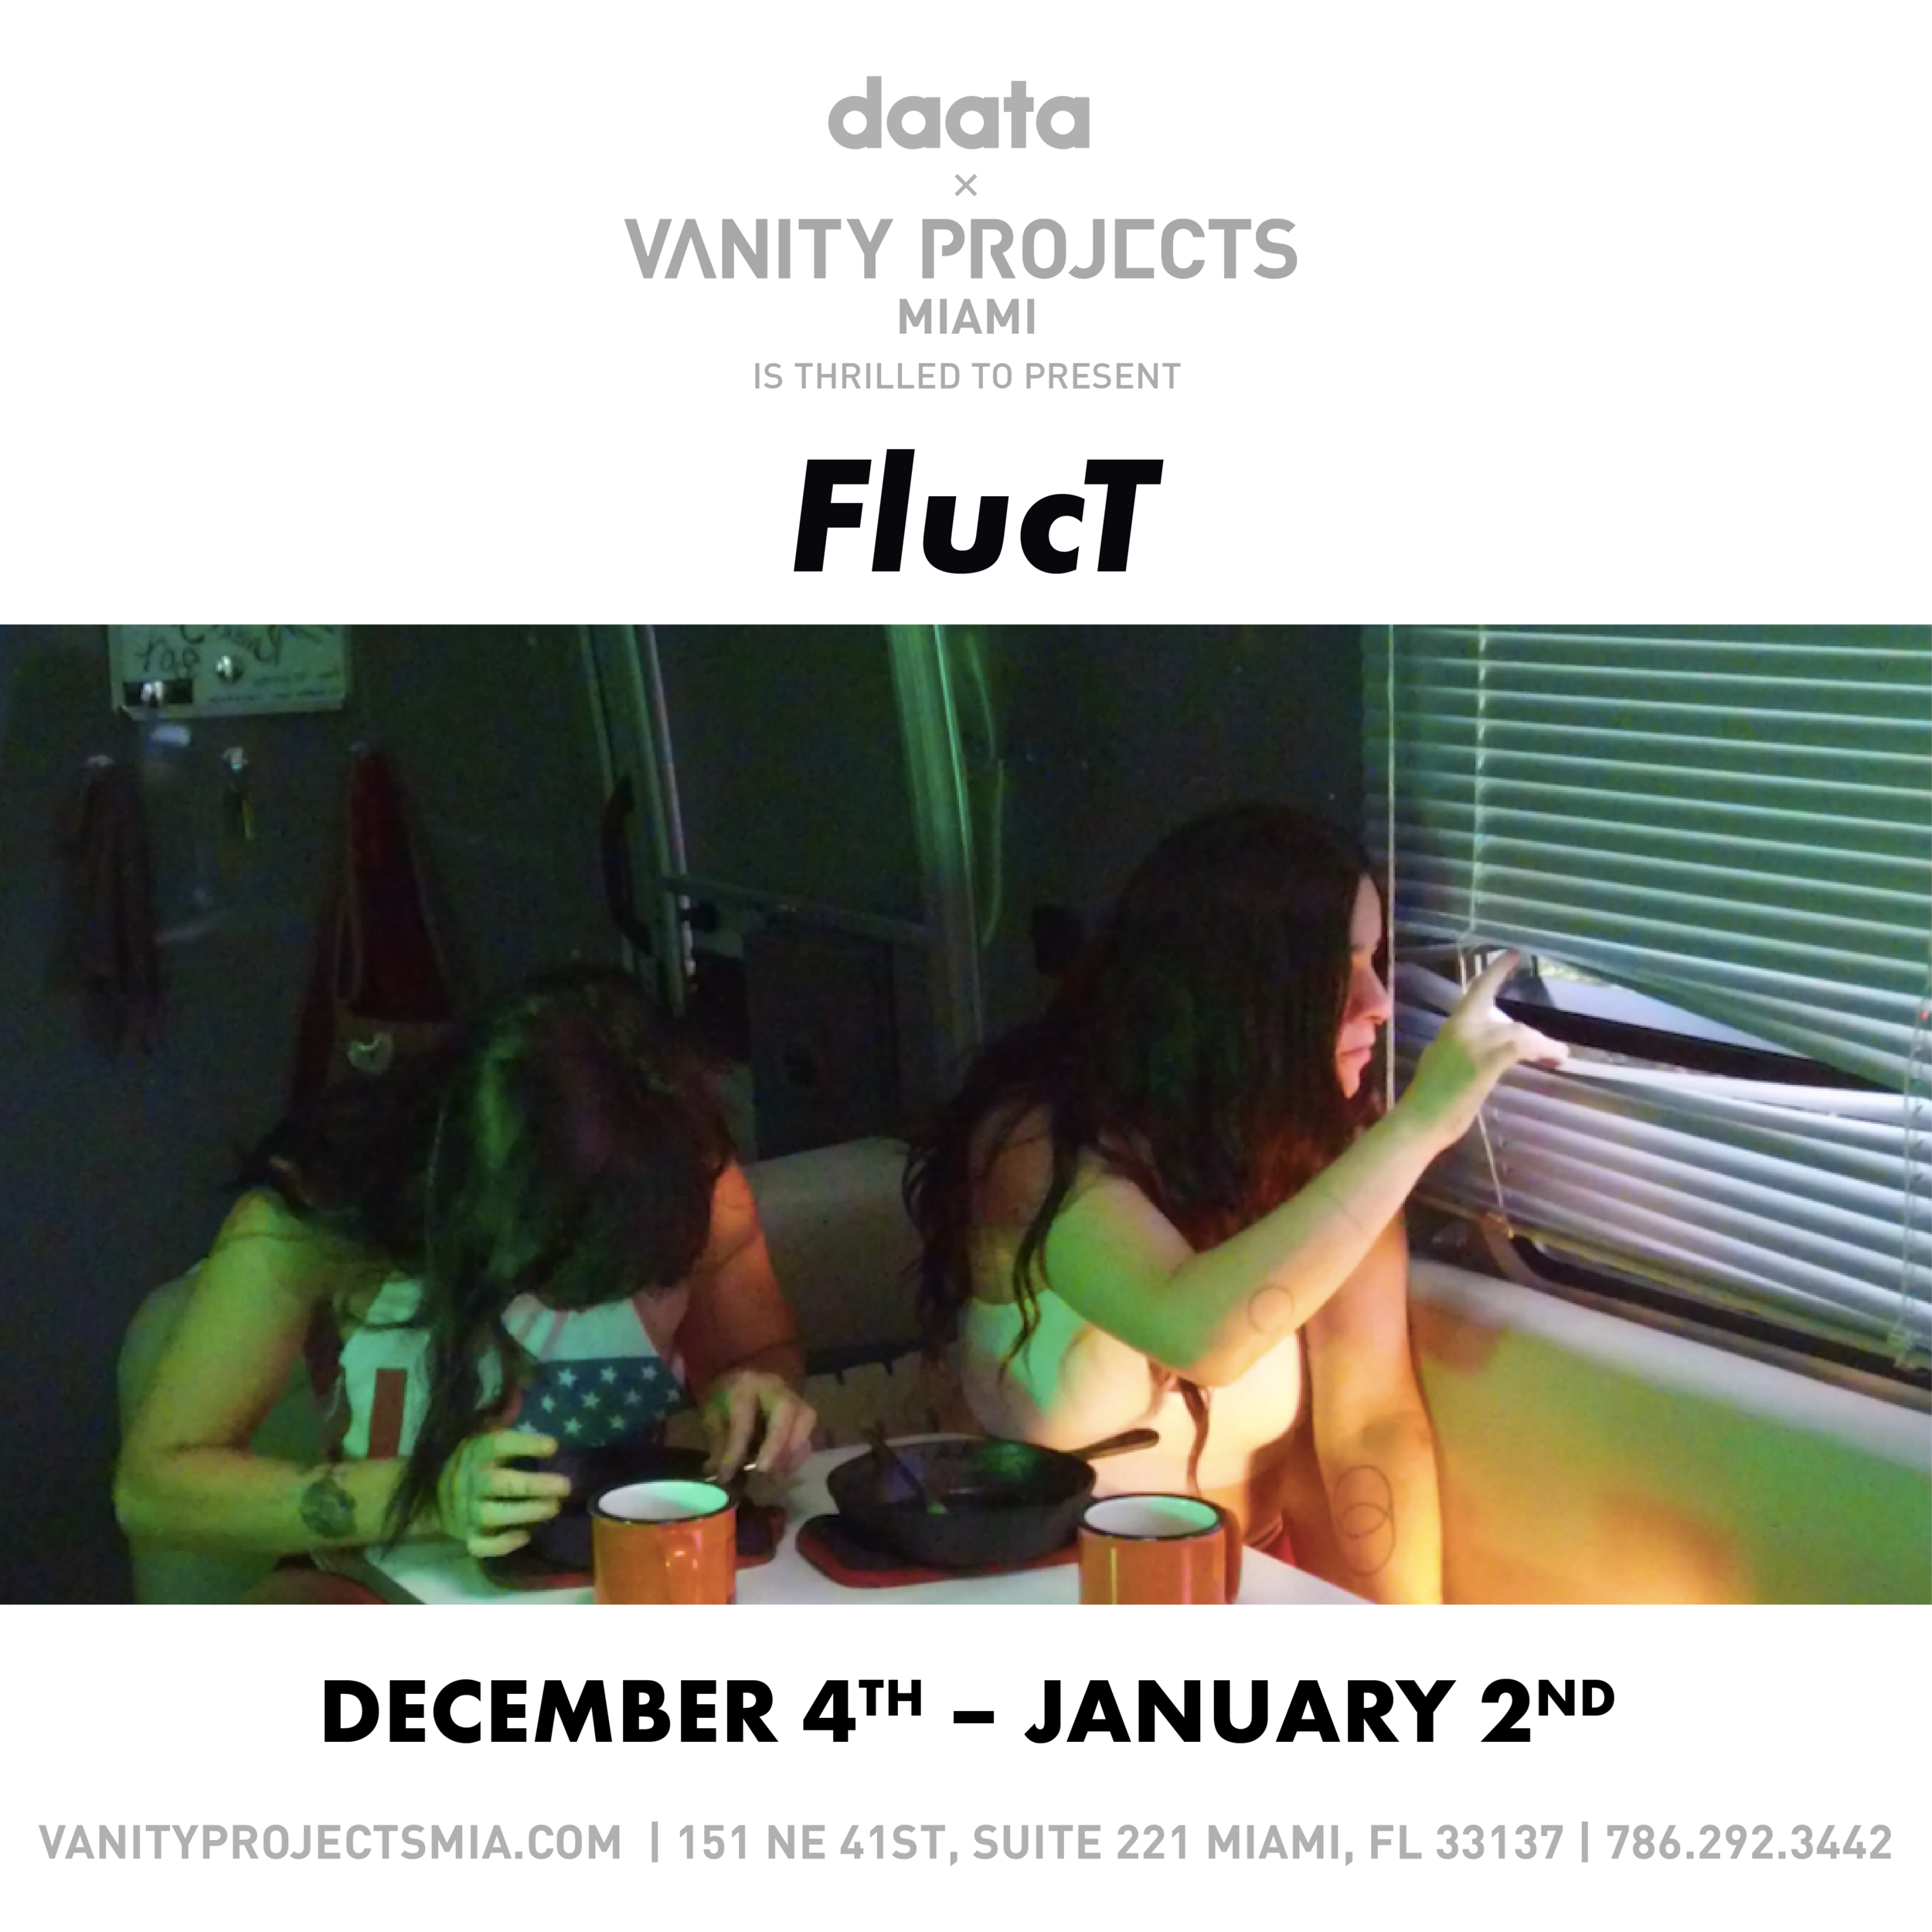 FLUCT2_vpxdaata_invitealt.png